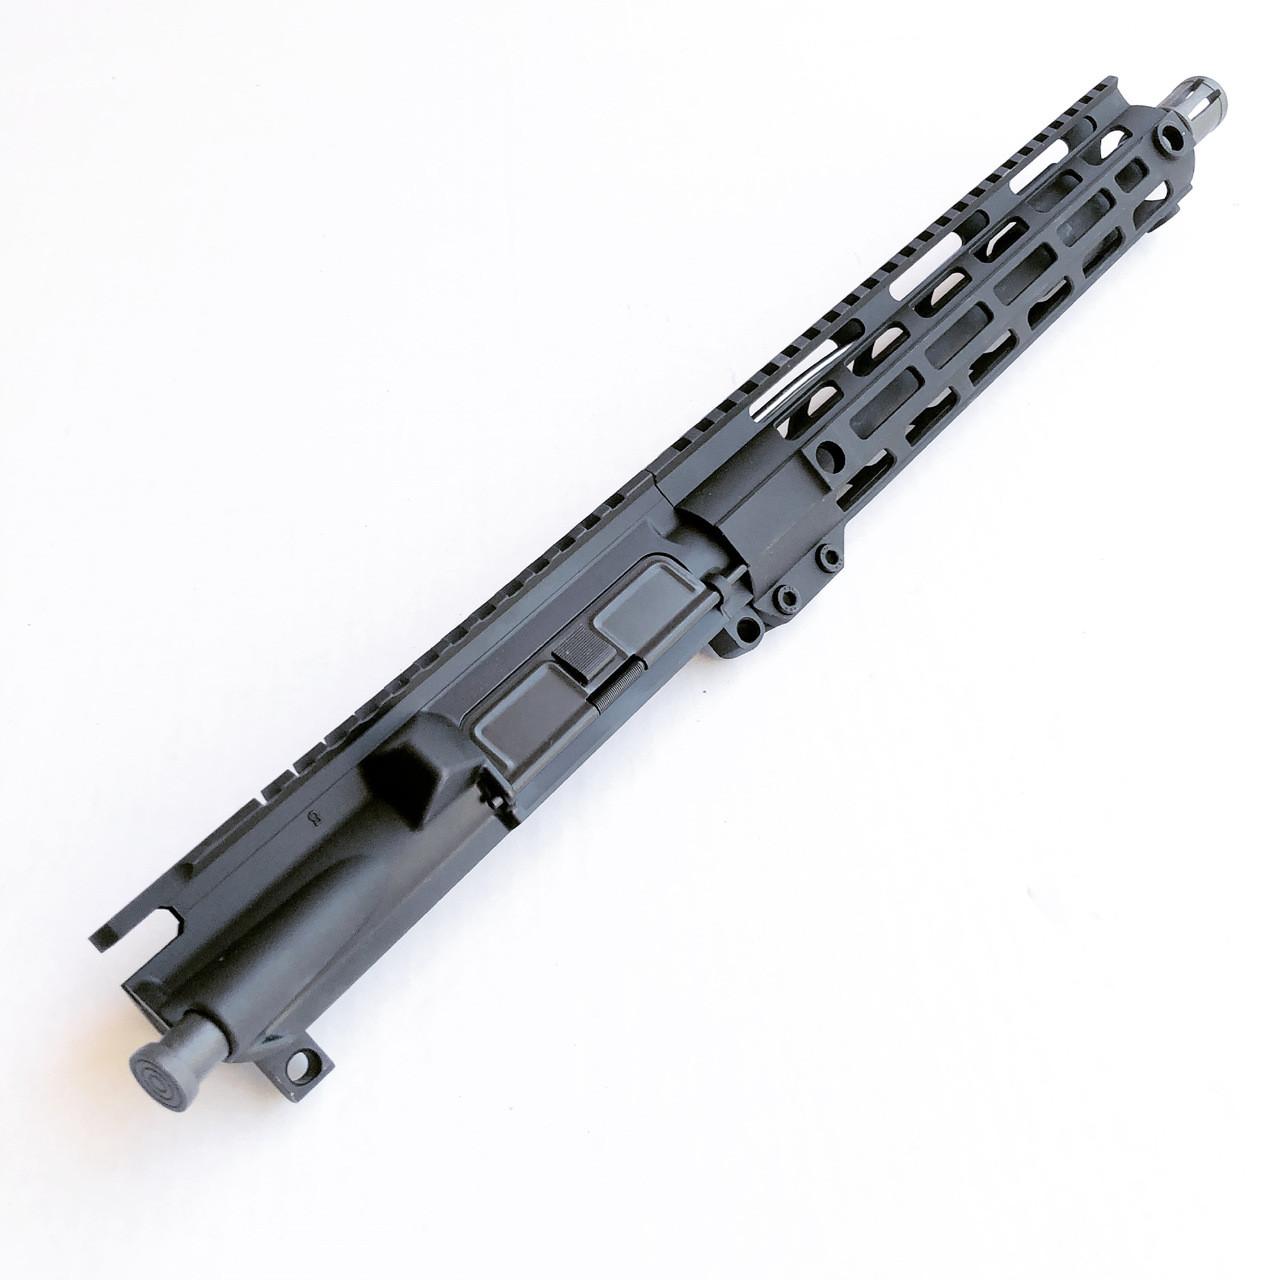 "MCS AR-15 Pistol Upper, .300 Blackout, 7.5"" Barrel, 1:8 Twist, Pistol Gas System"